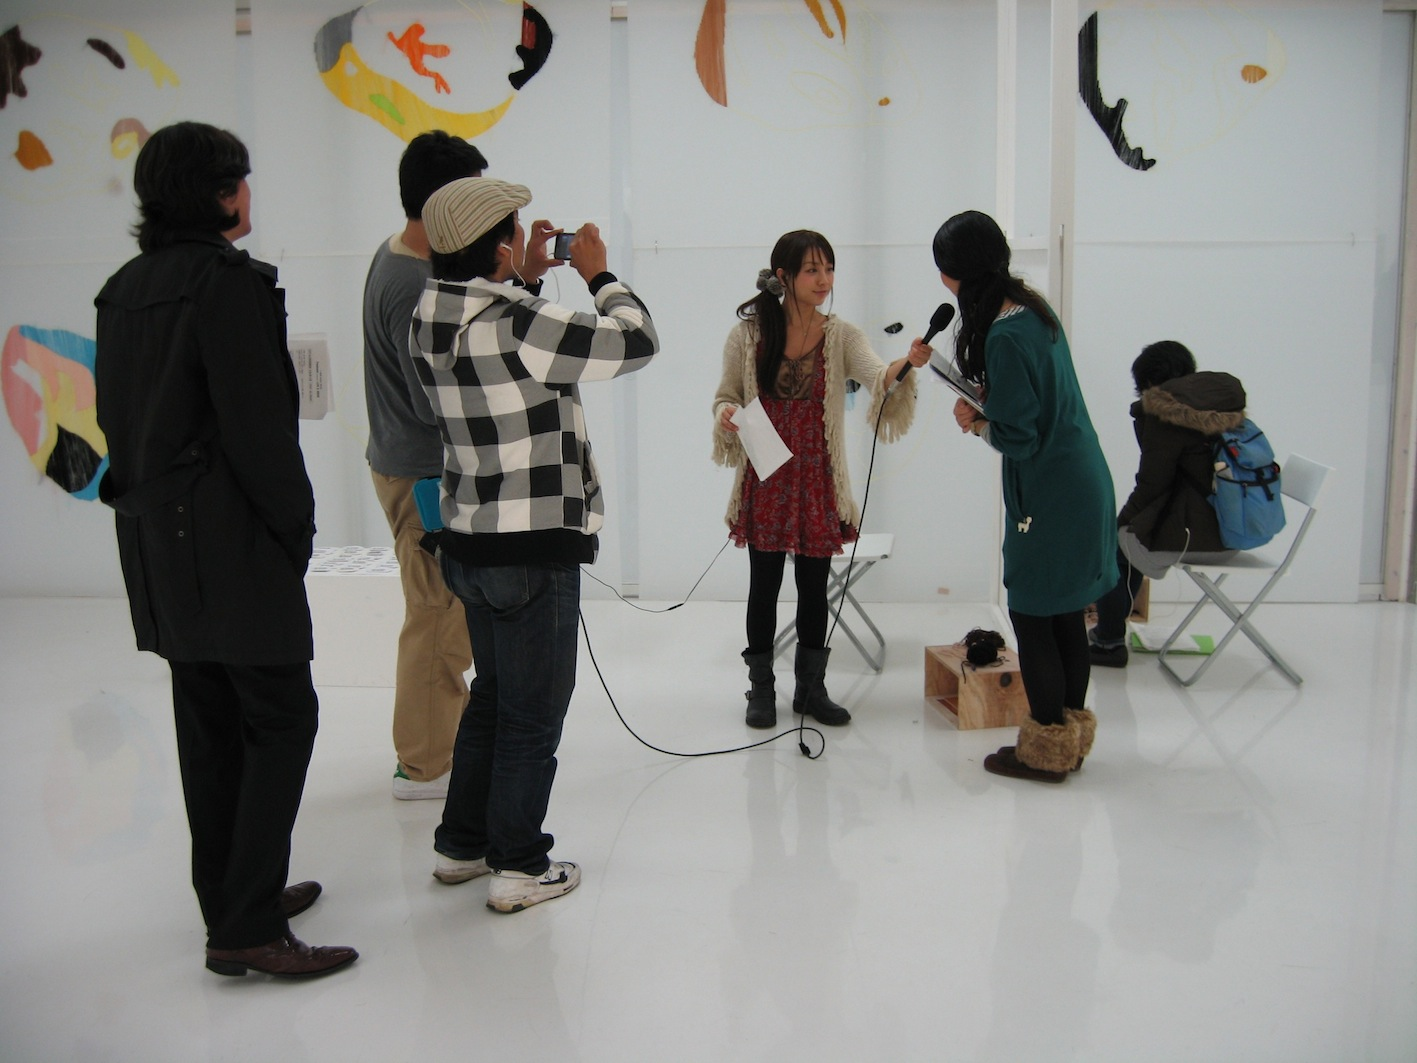 http://blog.3331.jp/staff/file/IMG_0151.JPG